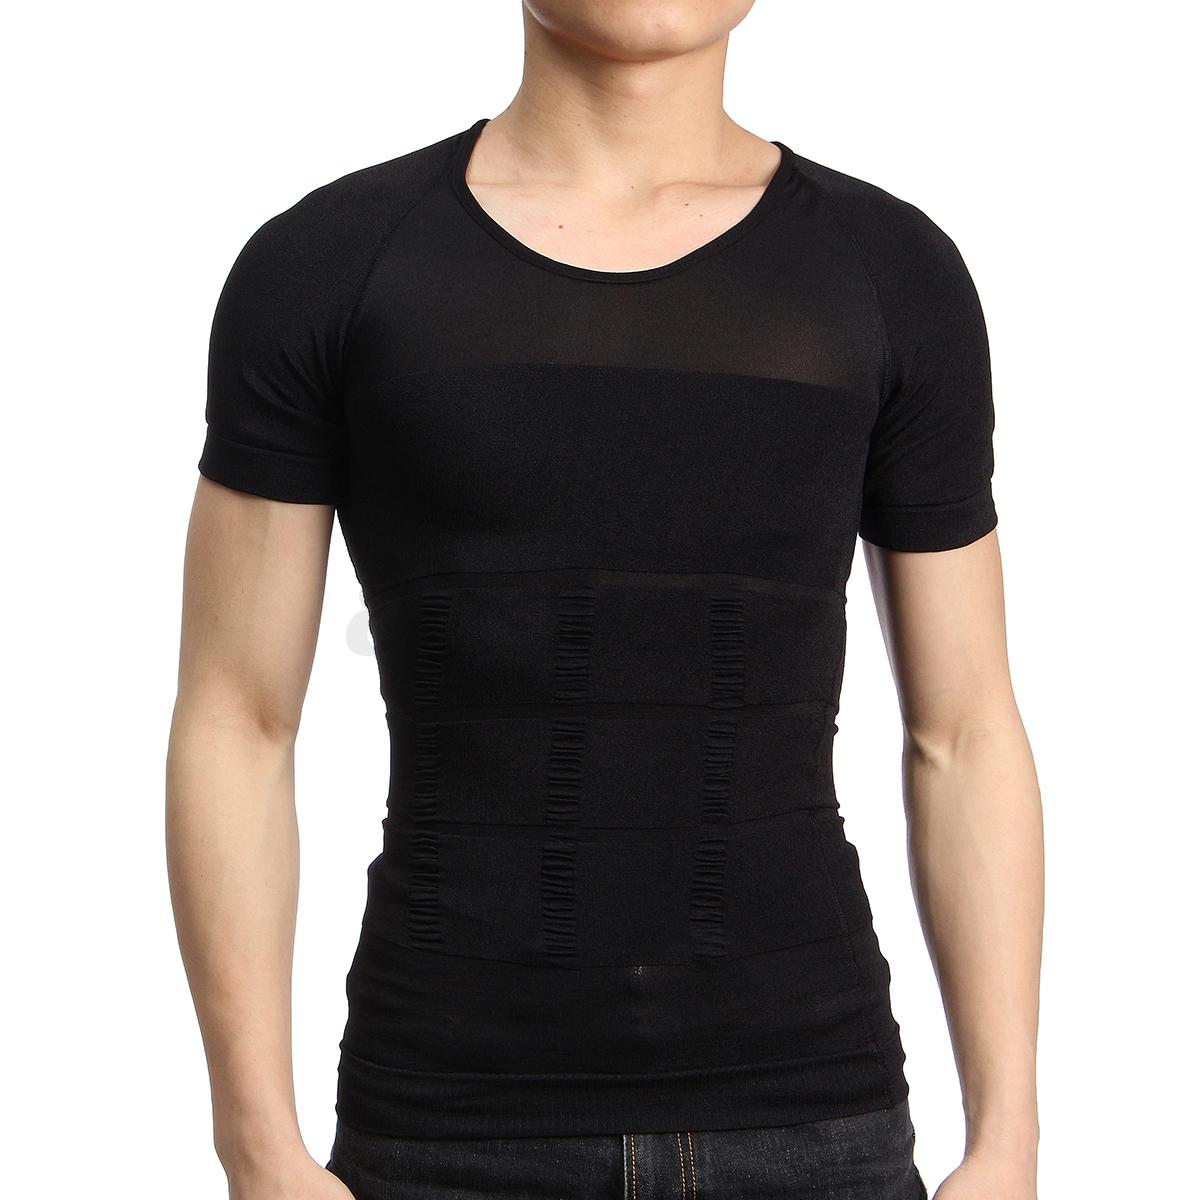 Mens Slimming T Shirts